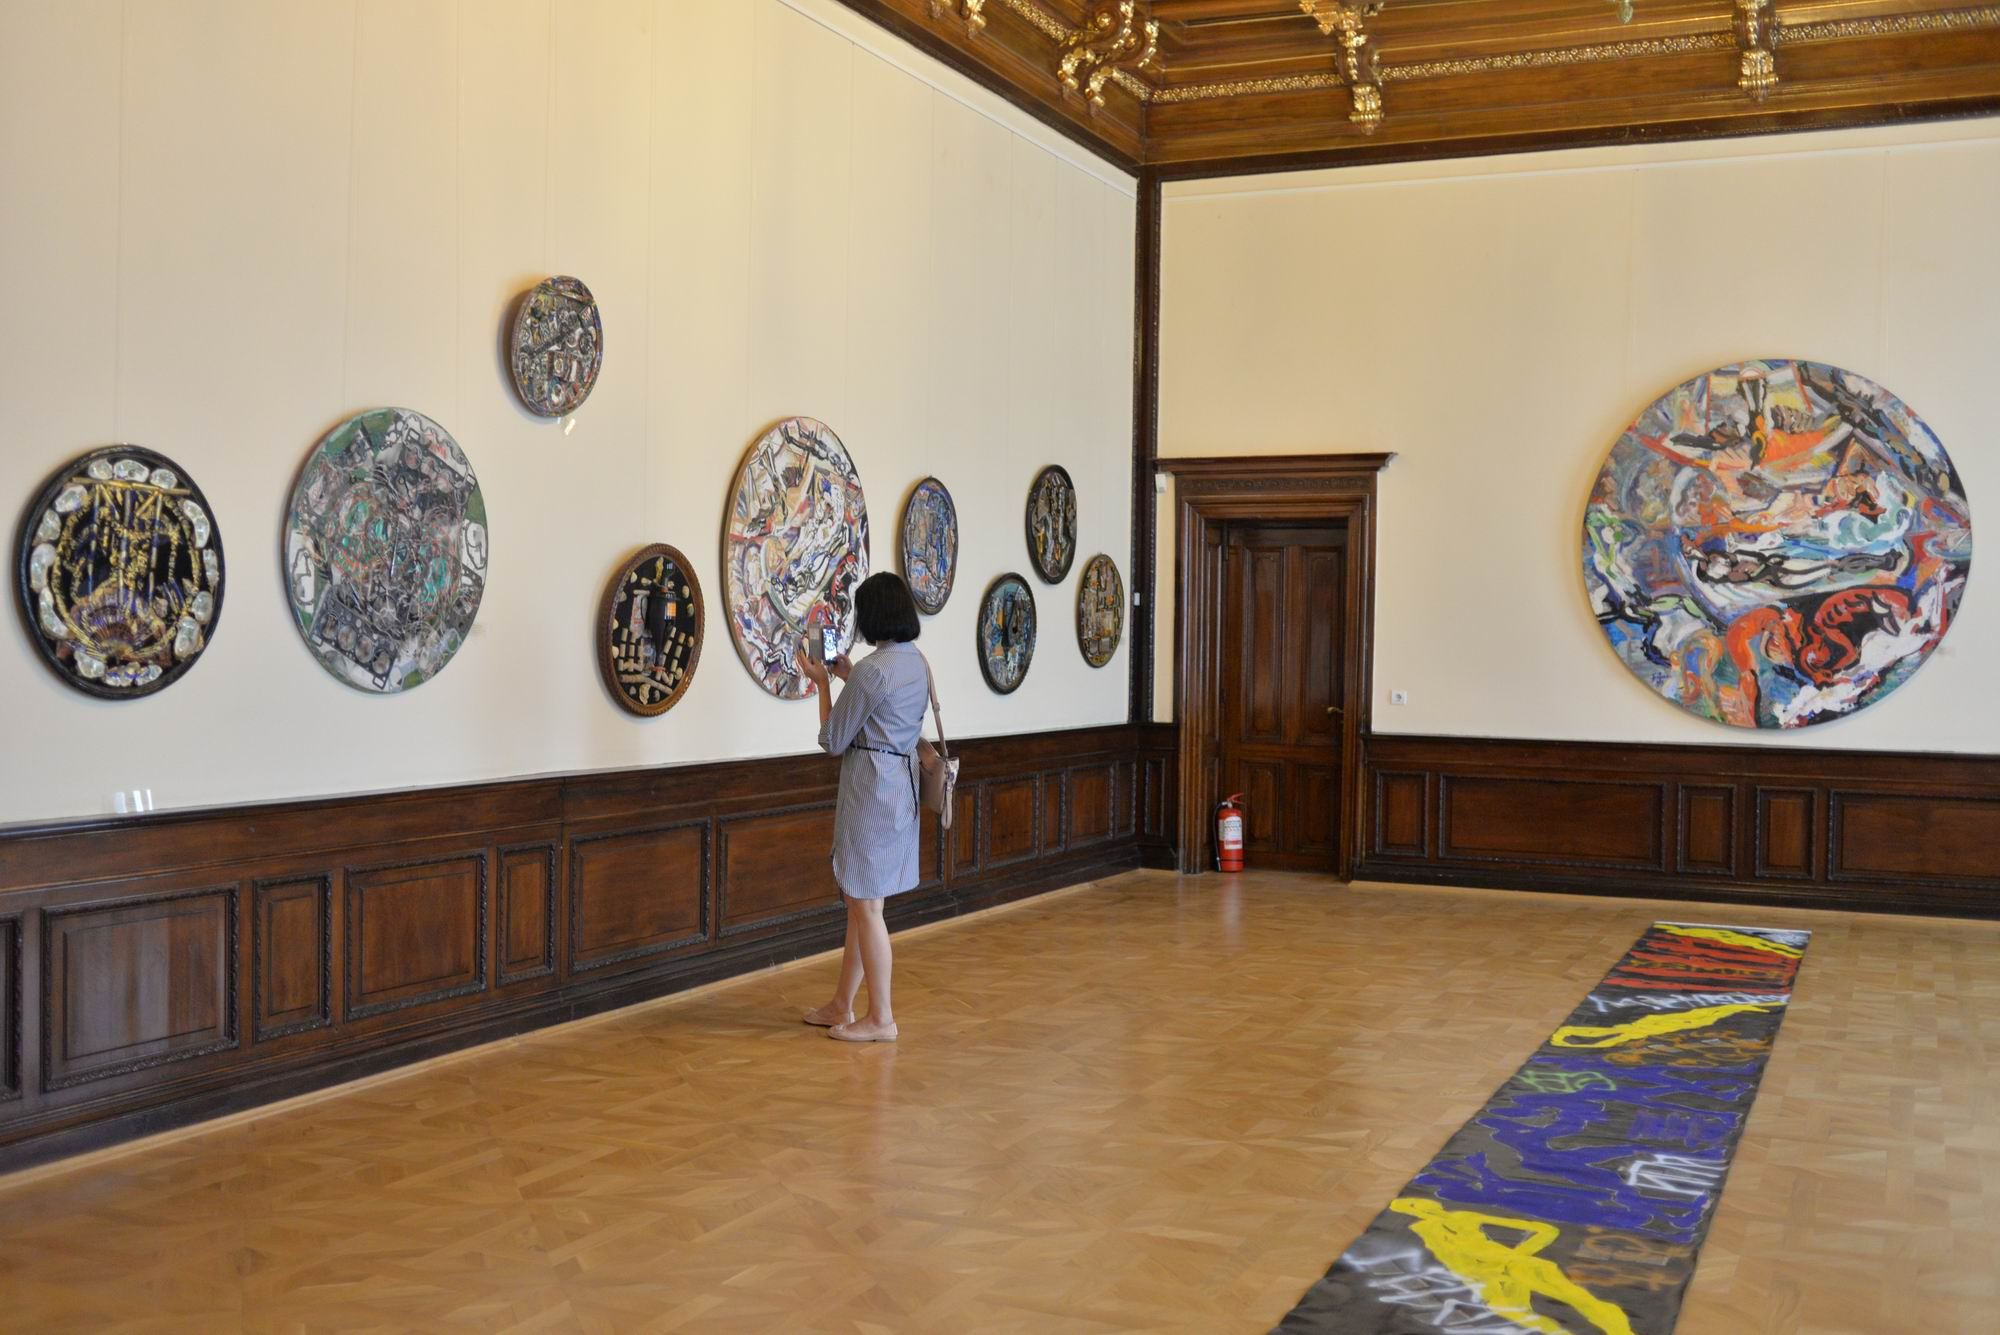 Mihail Trifan - Muzeul de Arta Craiova  LM_0019